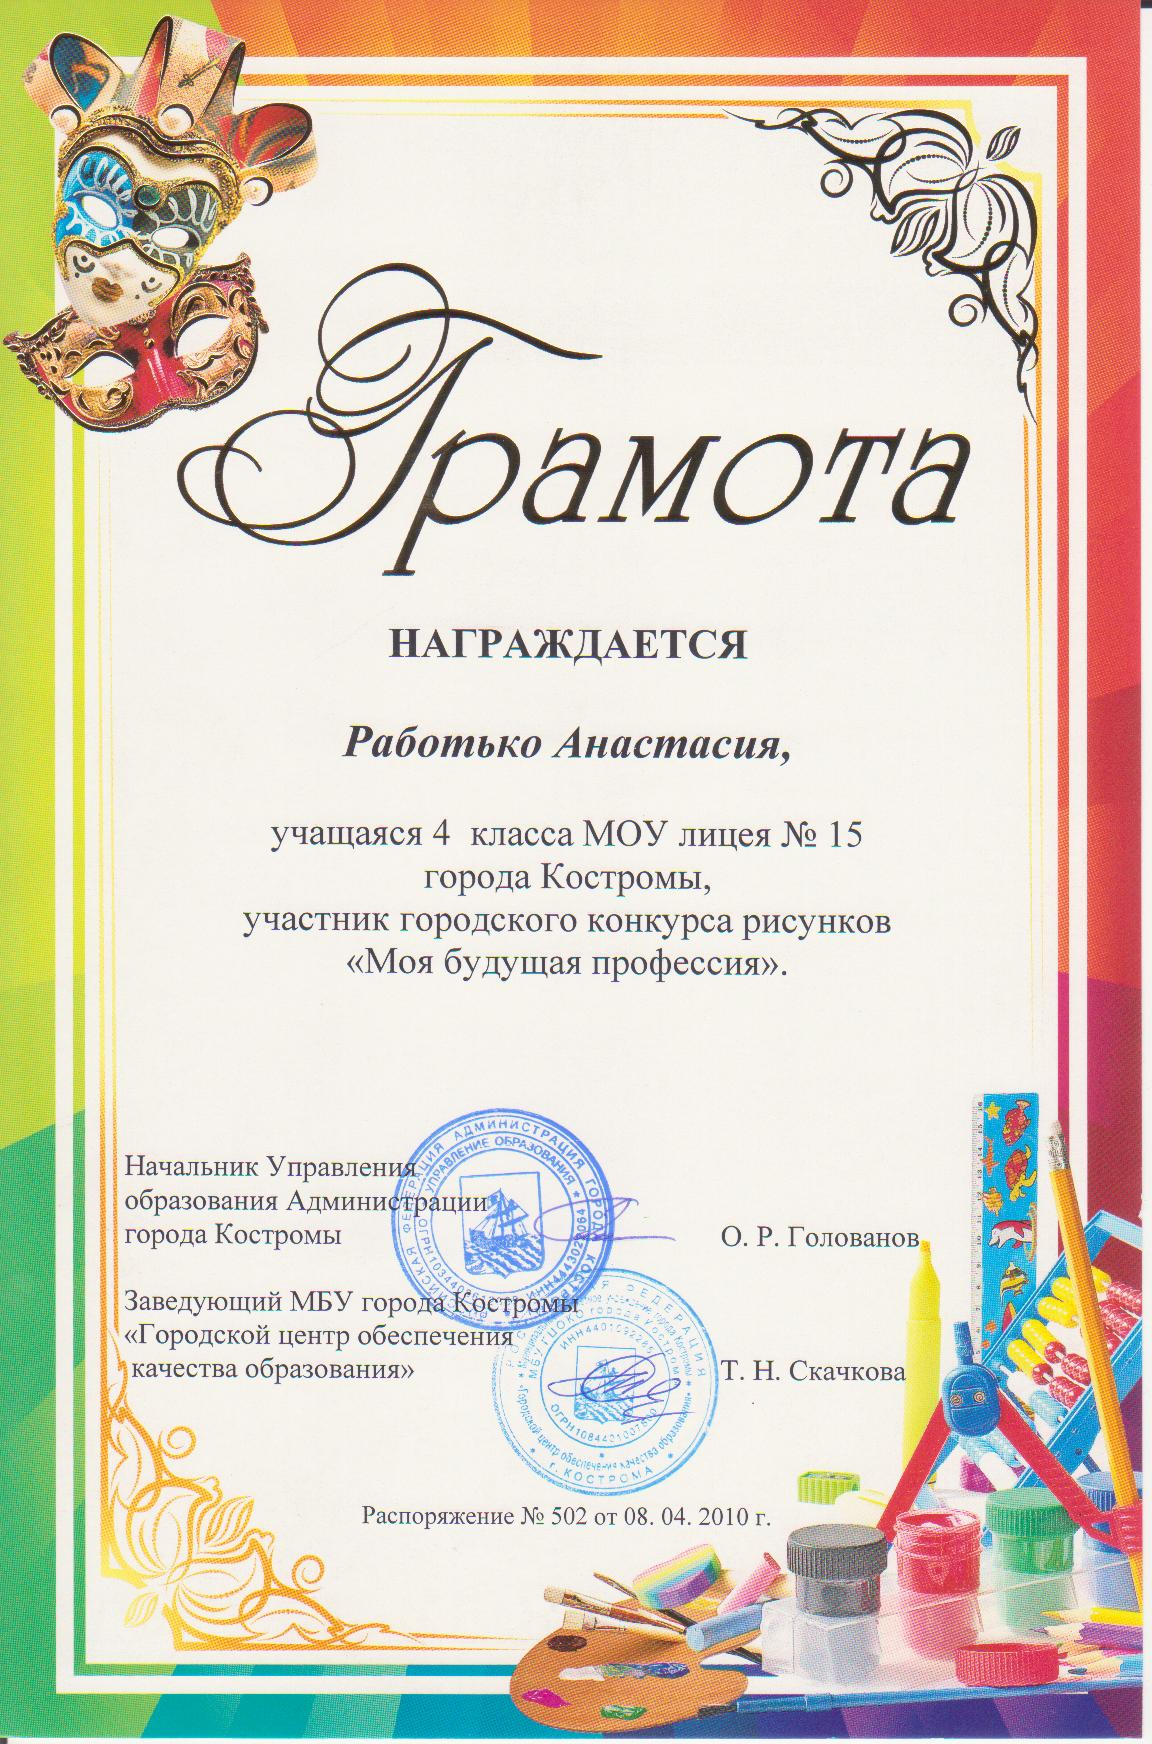 Скачать шаблон сертификат участника конкурса шаблон 108